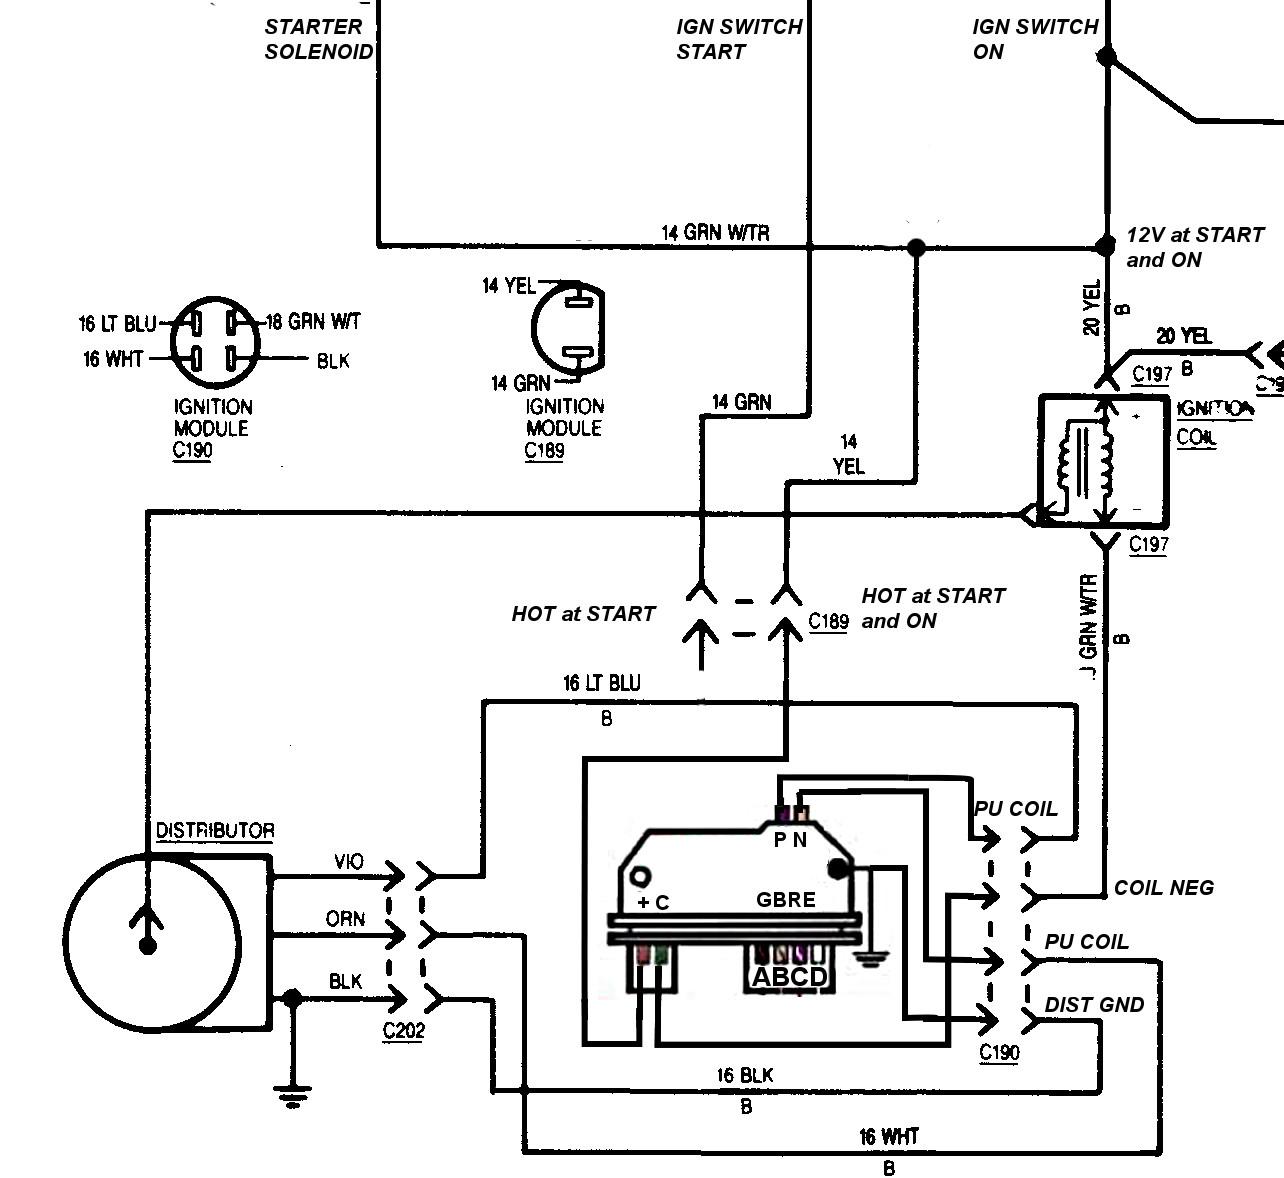 chevy hei distributor wiring diagram 1975 chevy hei wiring diagram wiring diagram data  1975 chevy hei wiring diagram wiring